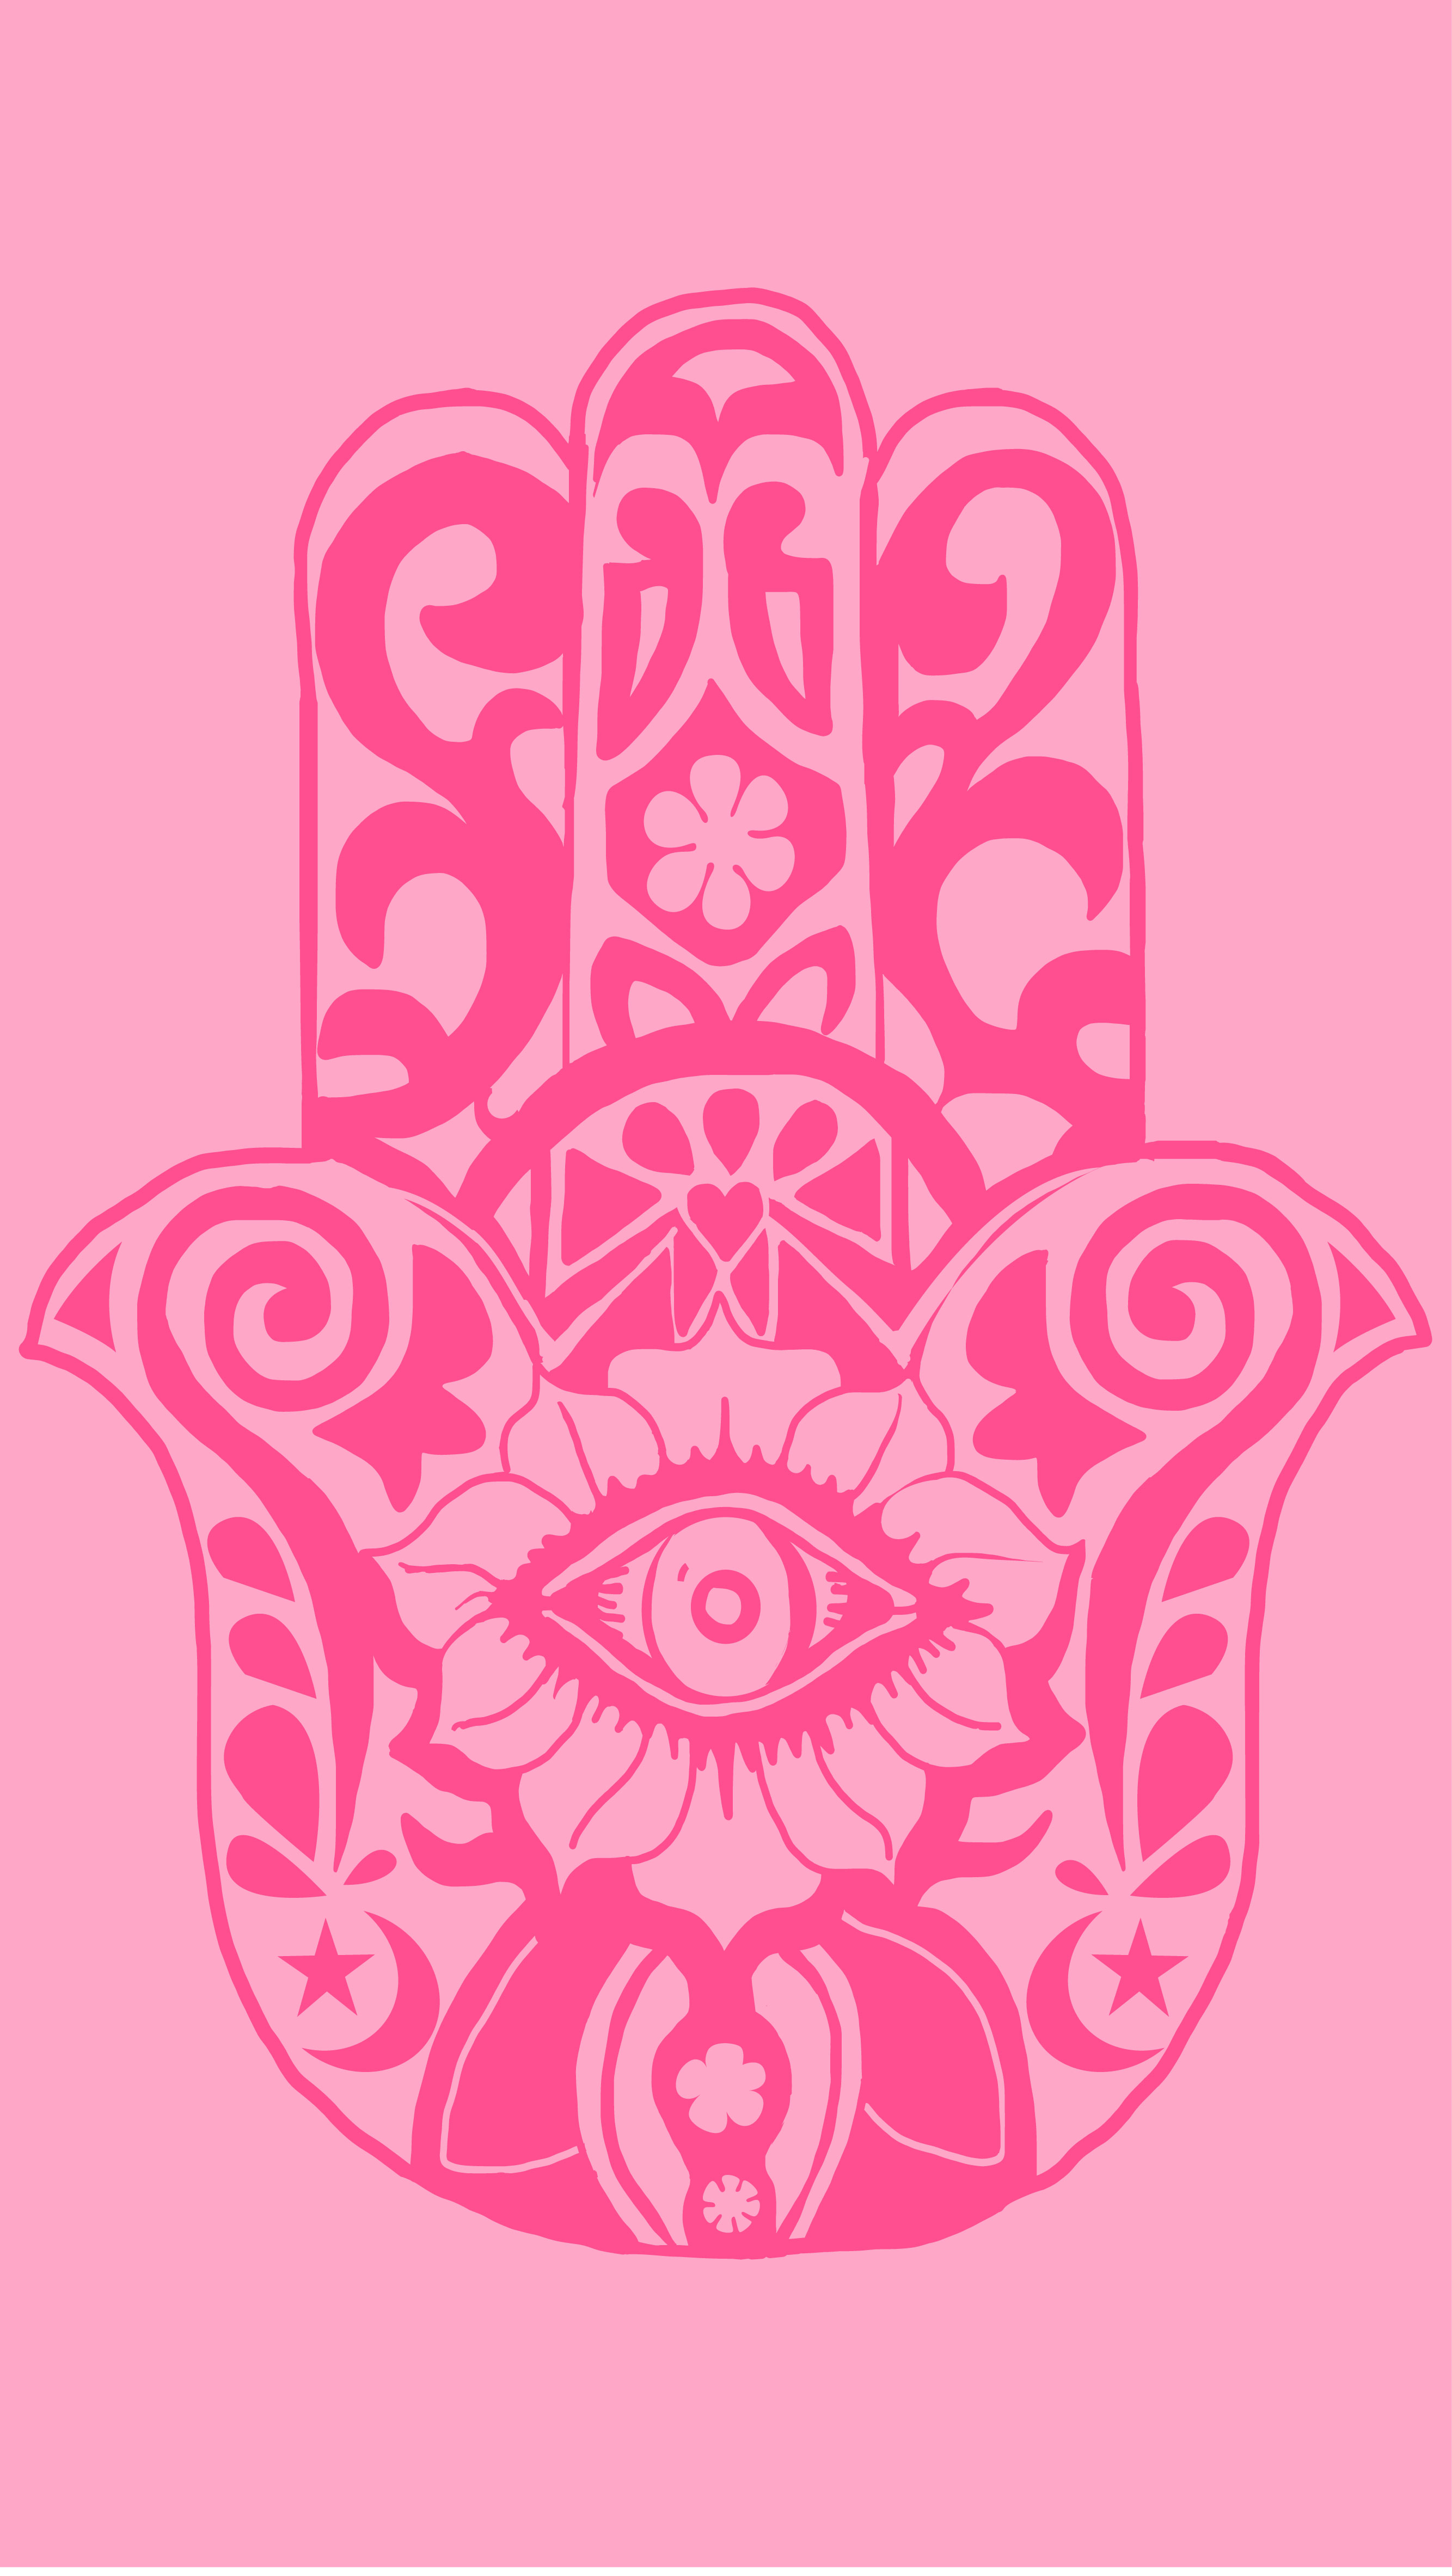 47 Tumblr Ipod 5 Wallpaper On Wallpapersafari